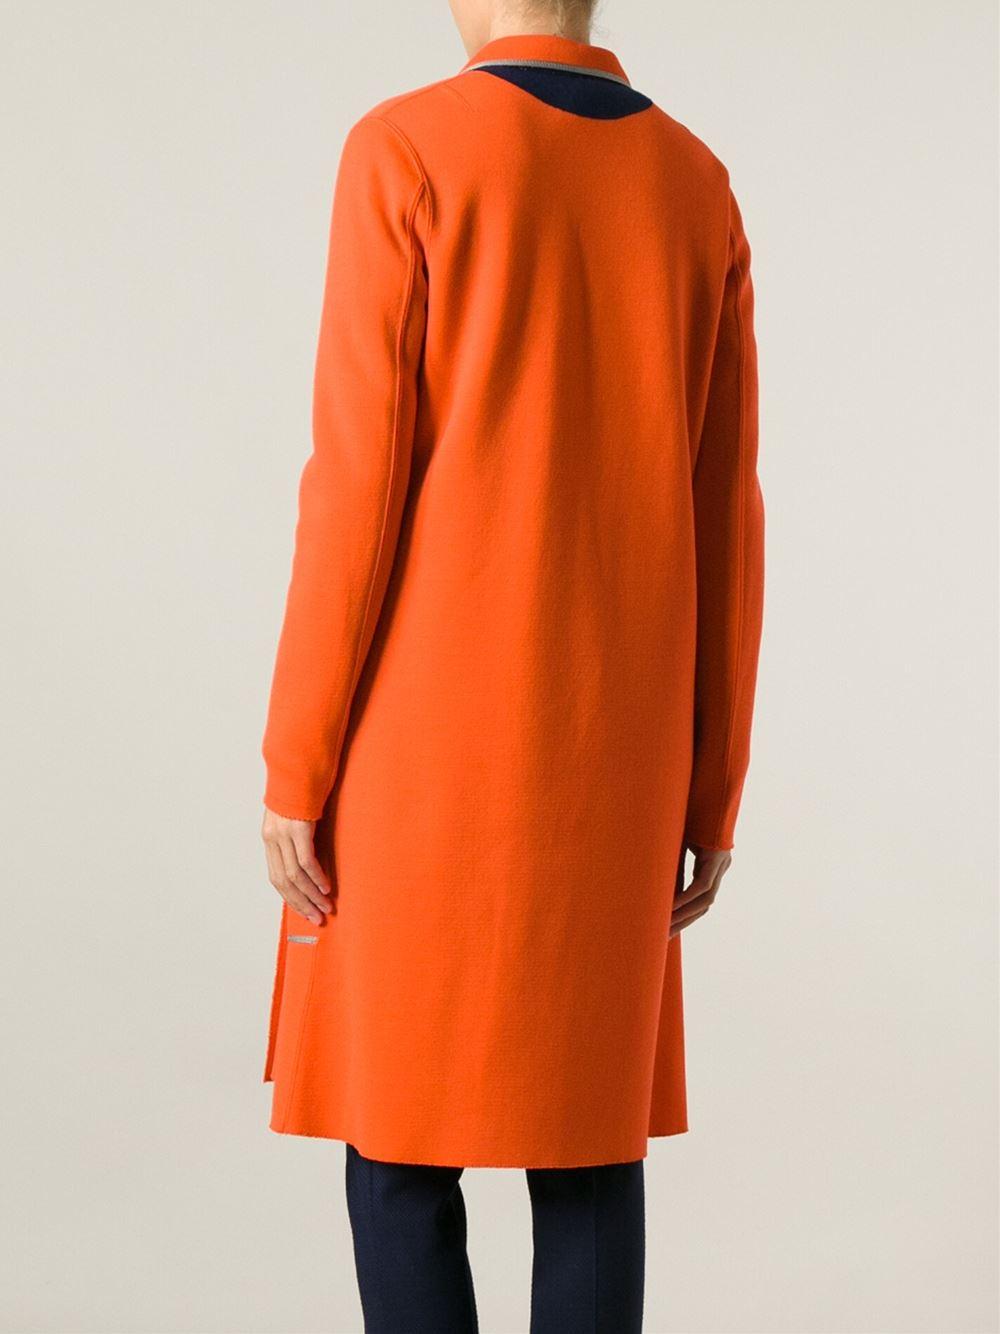 Lyst Kolor Contrast Trim Double Breasted Coat In Orange